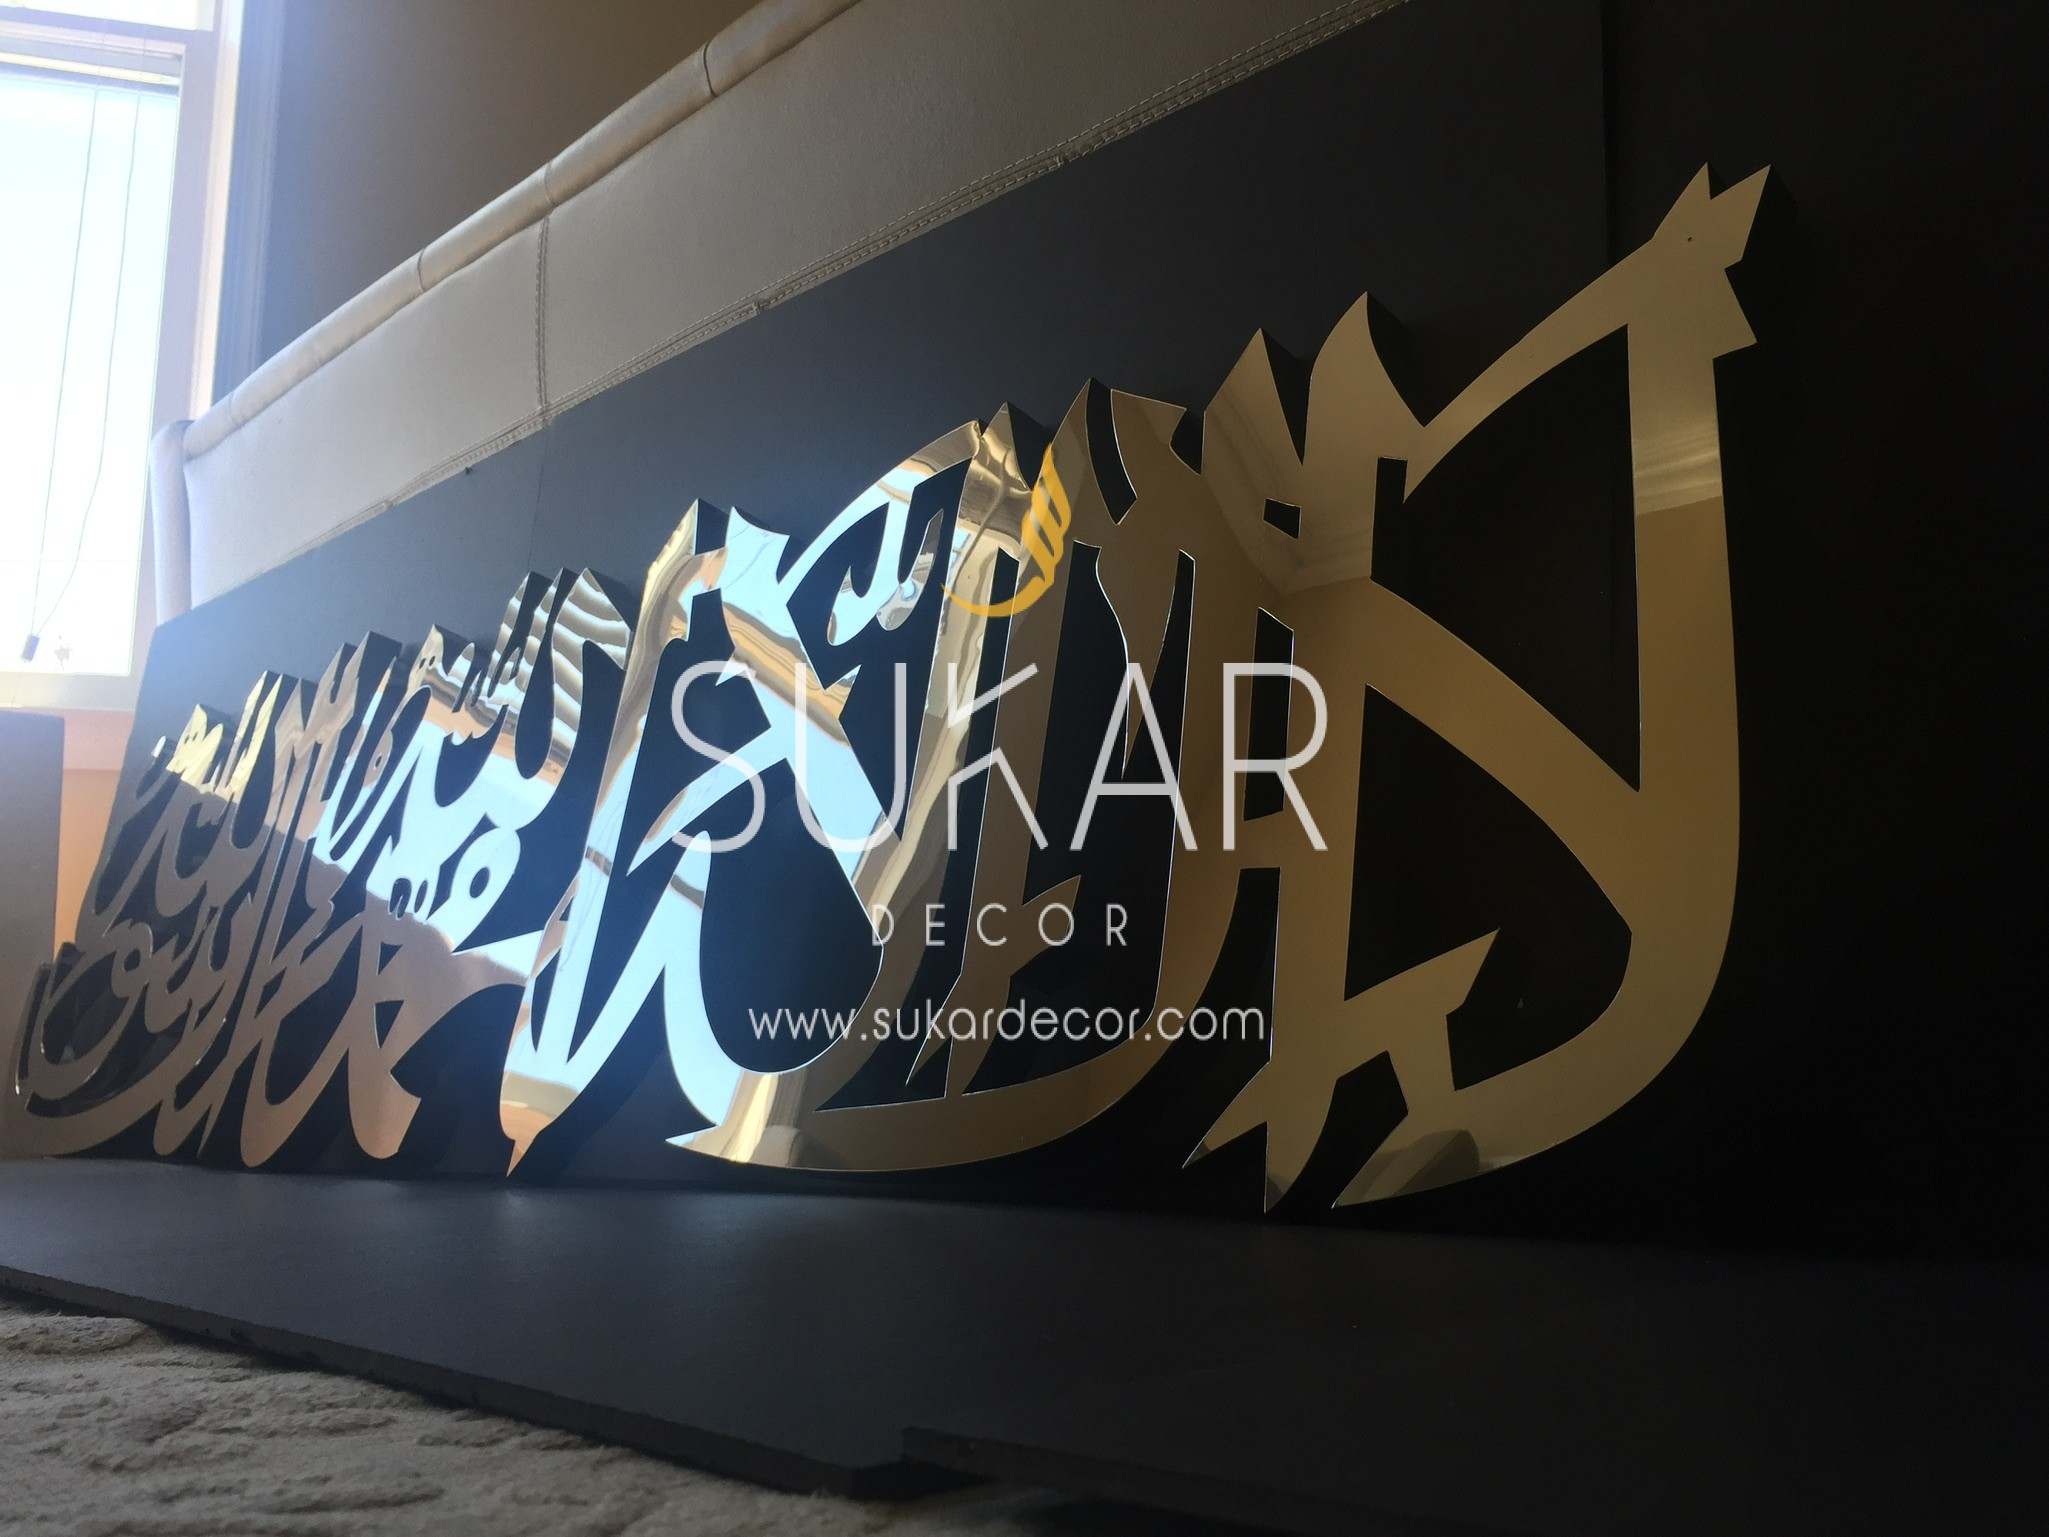 Shahada kalima grand modern islamic wall art for Stainless steel wall art